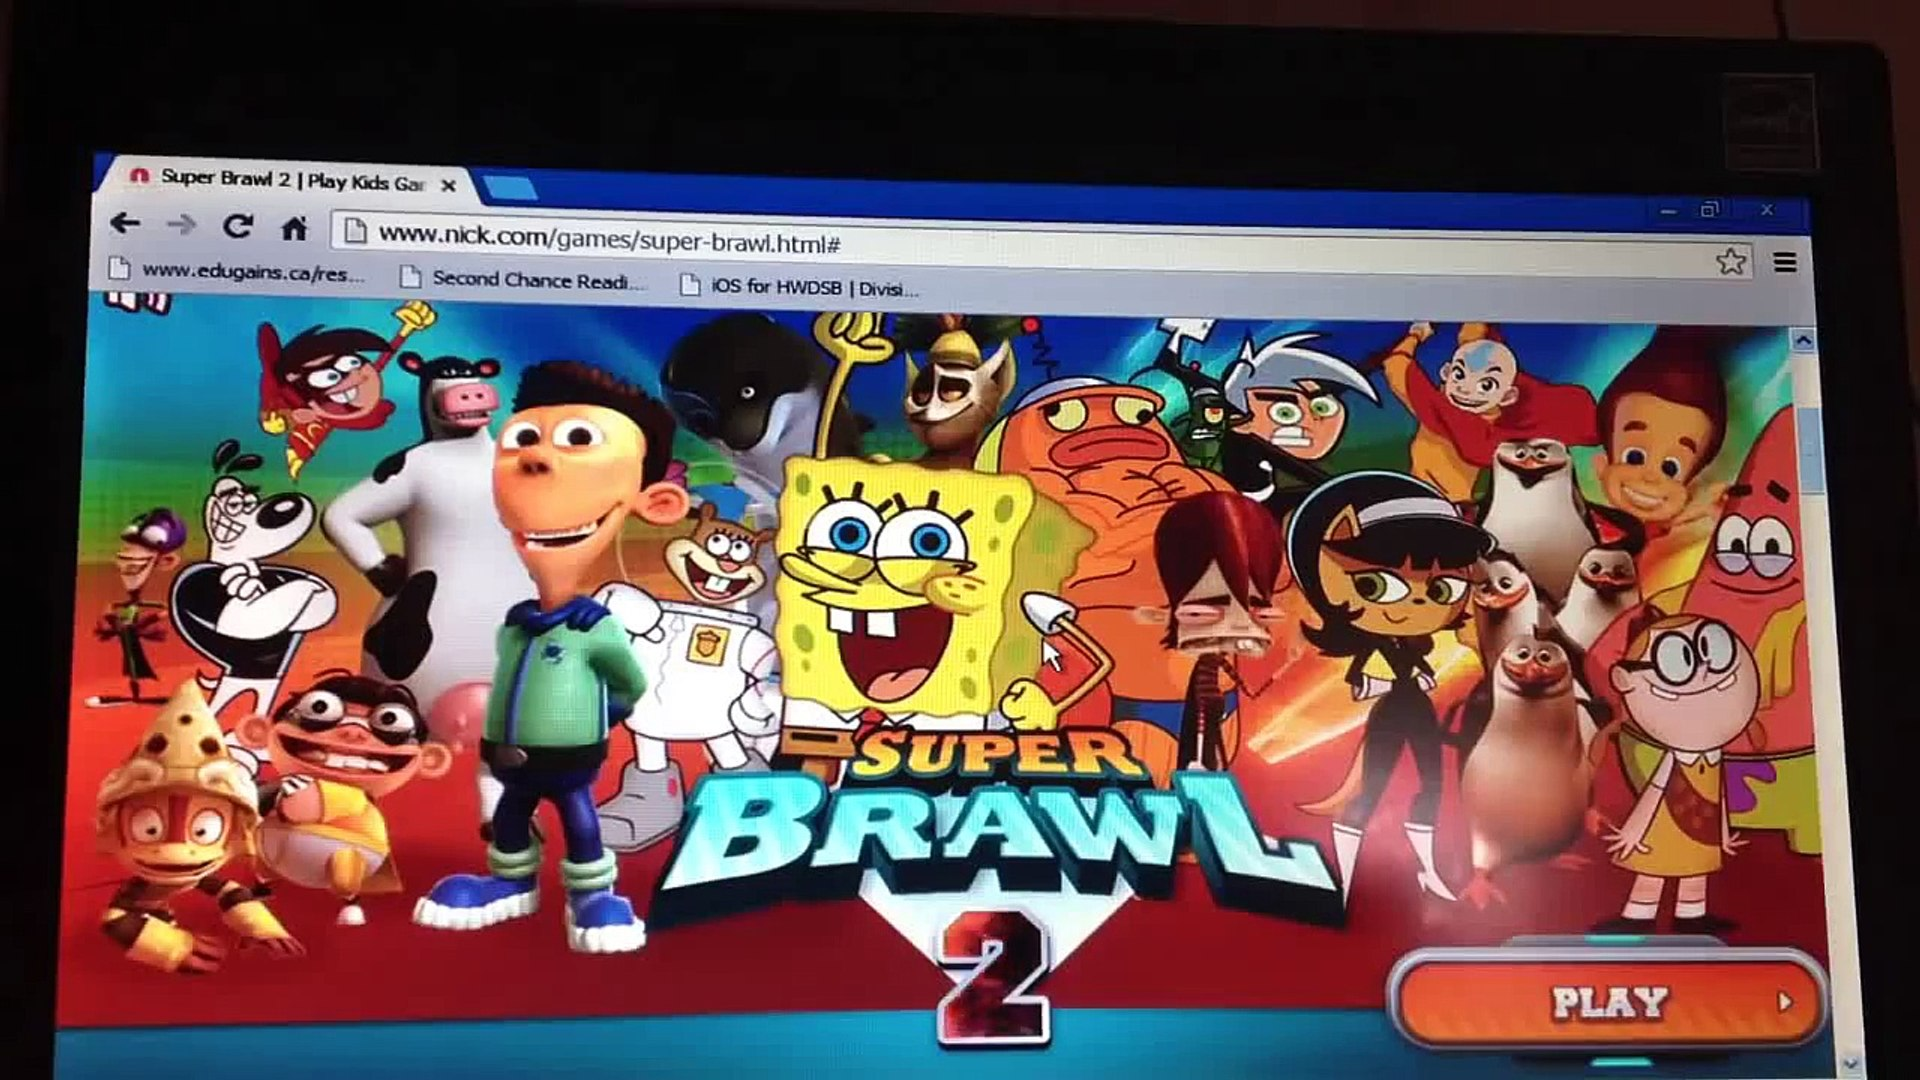 Games spongebob super brawl 2 casino nigerian series